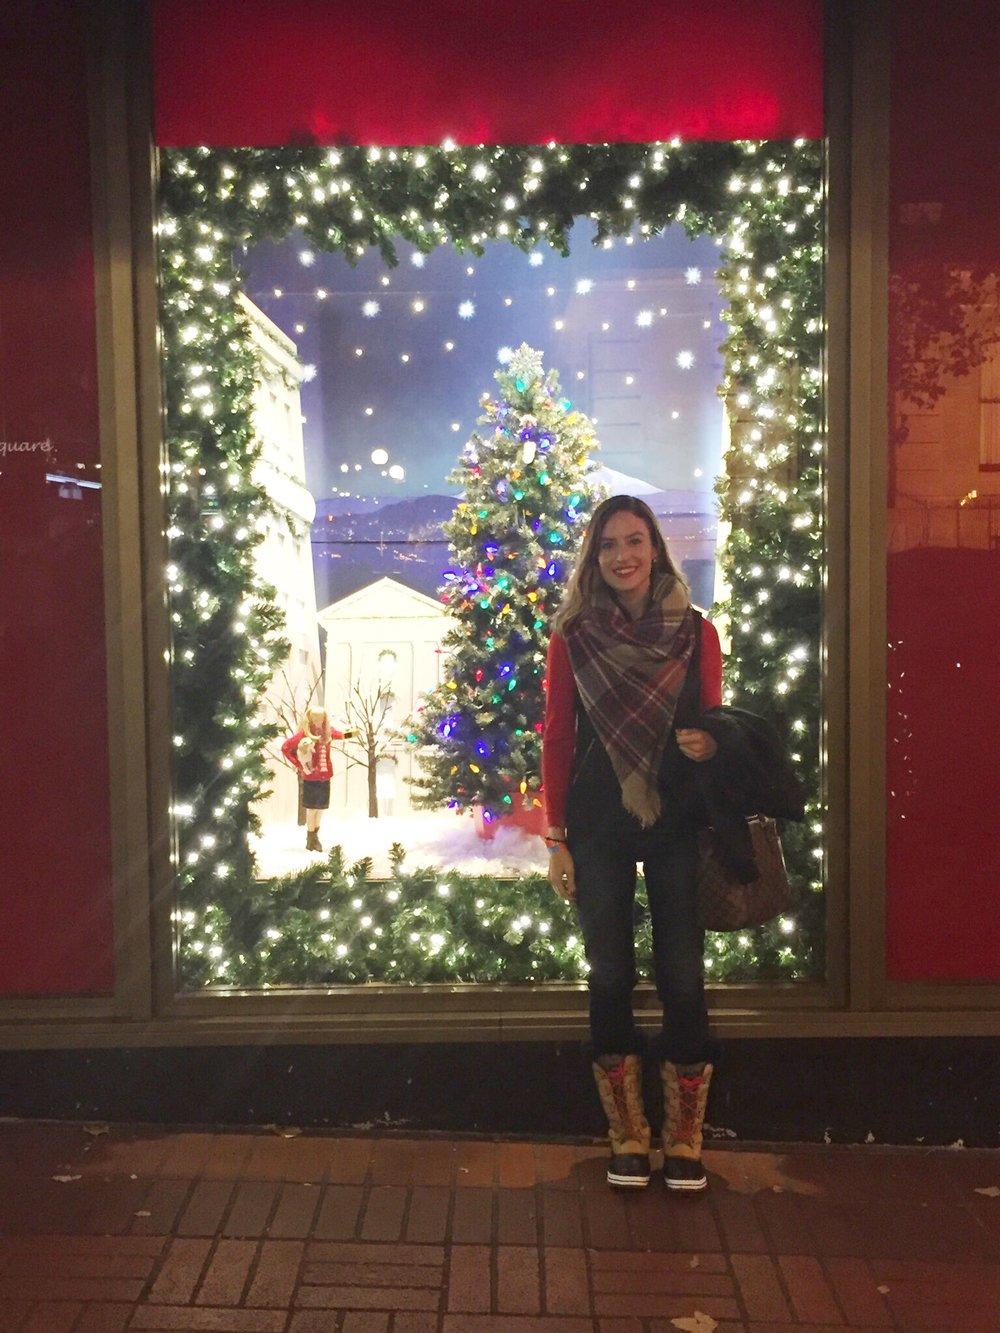 Macy's Christmas window in Portland, OR